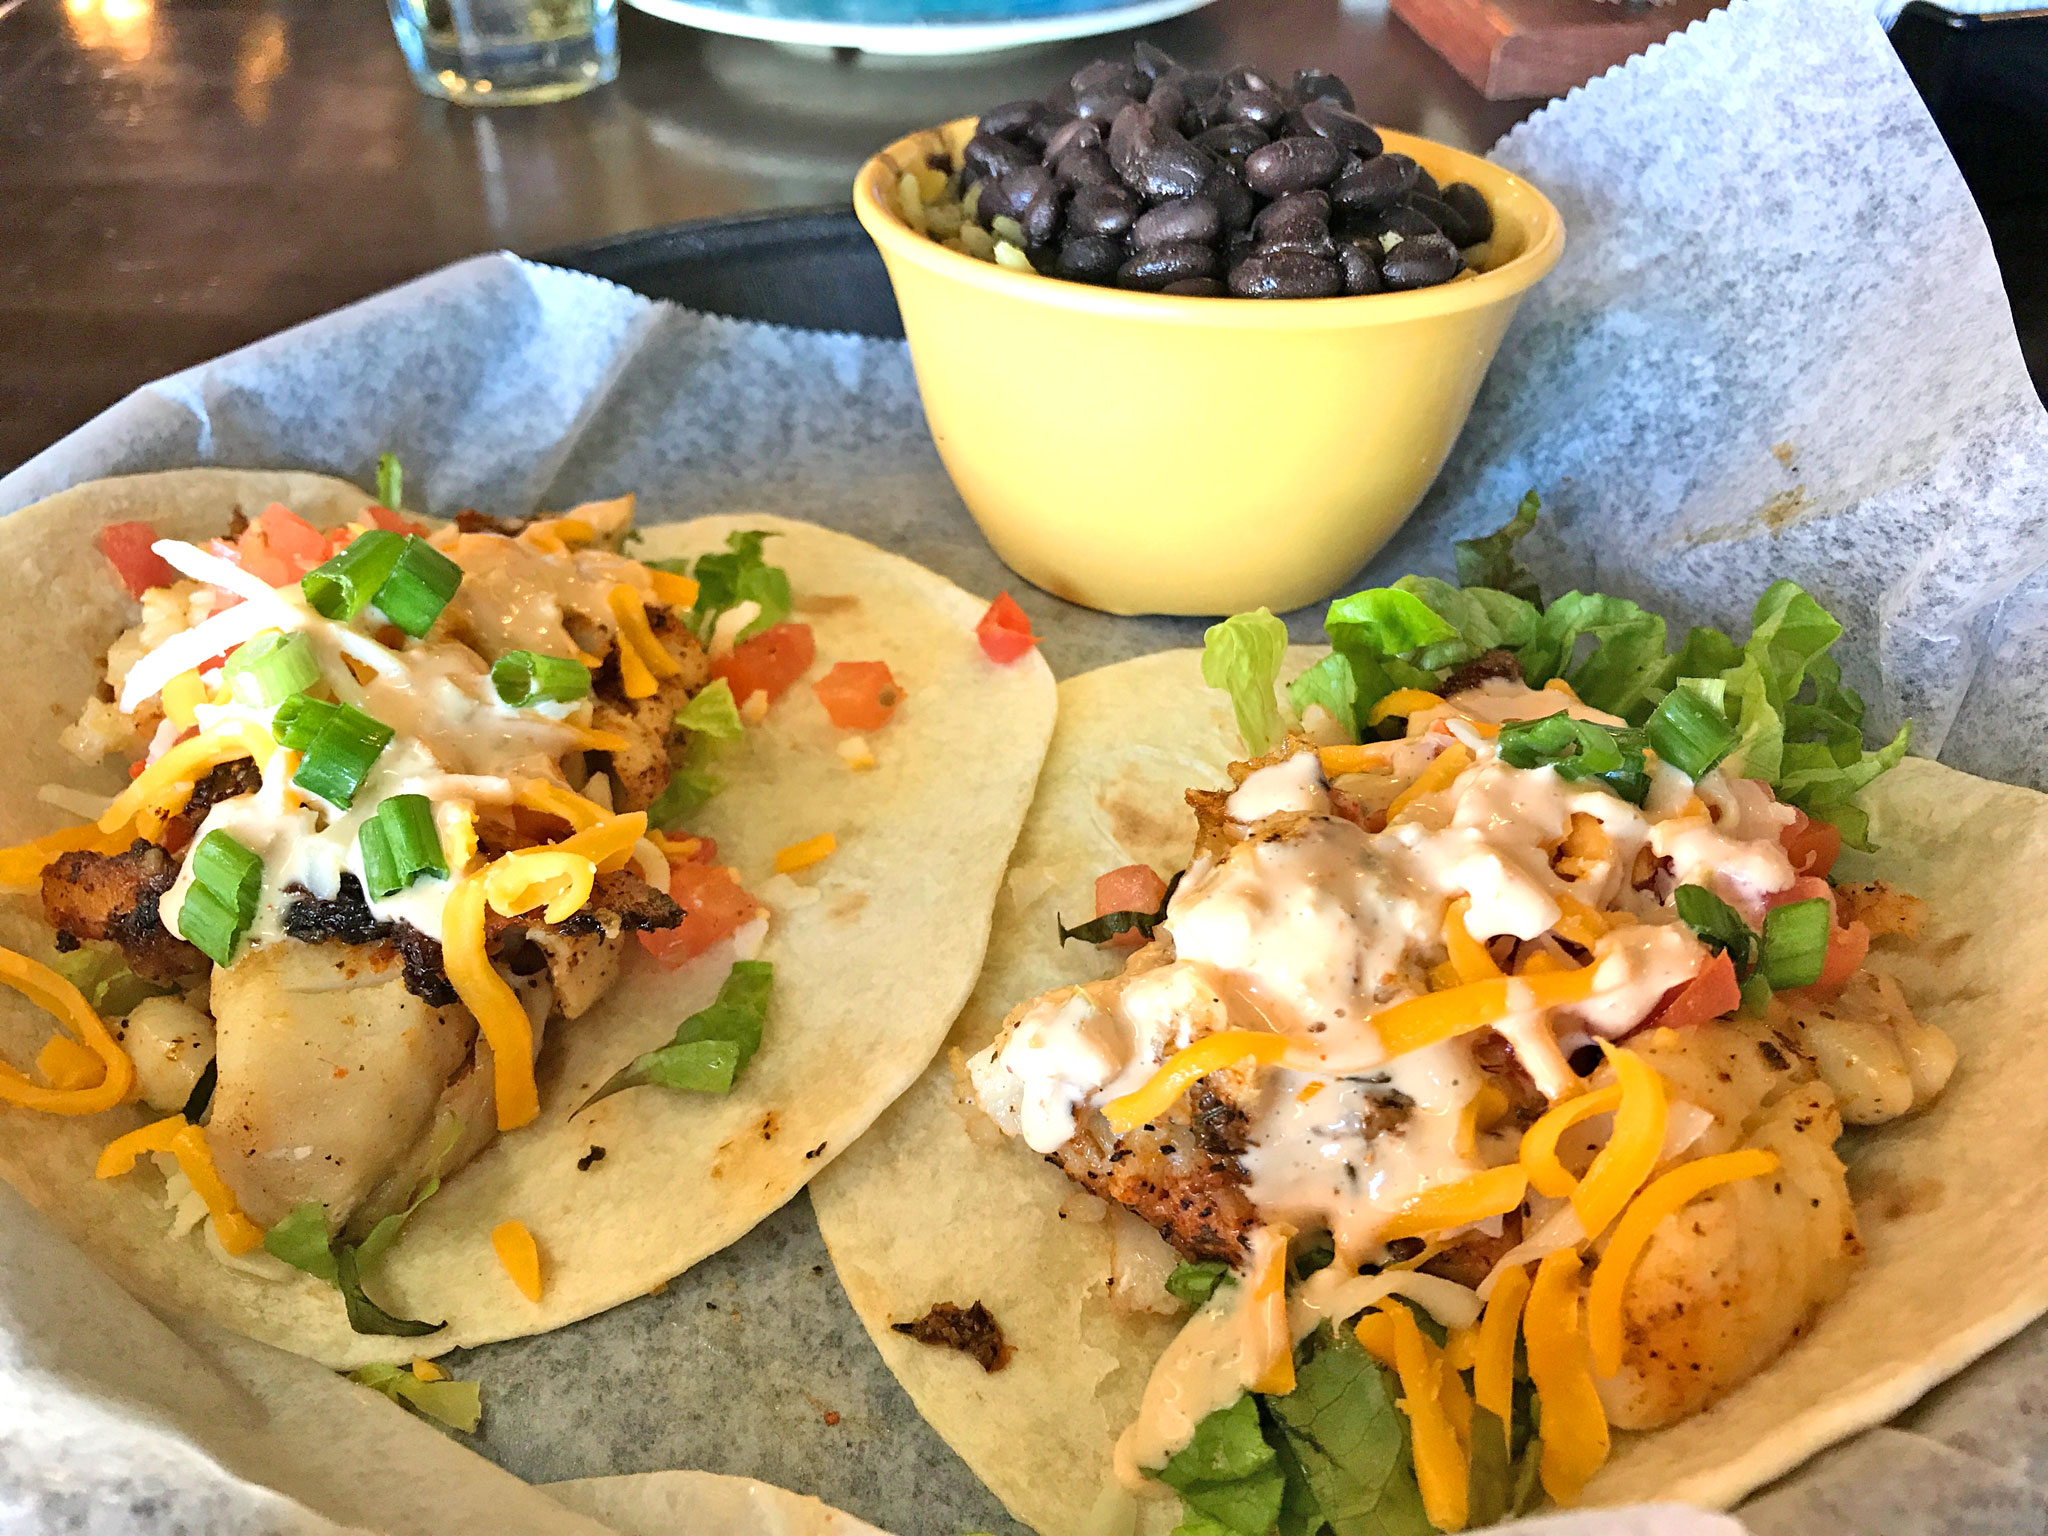 The Toasted Monkey Fish Tacos